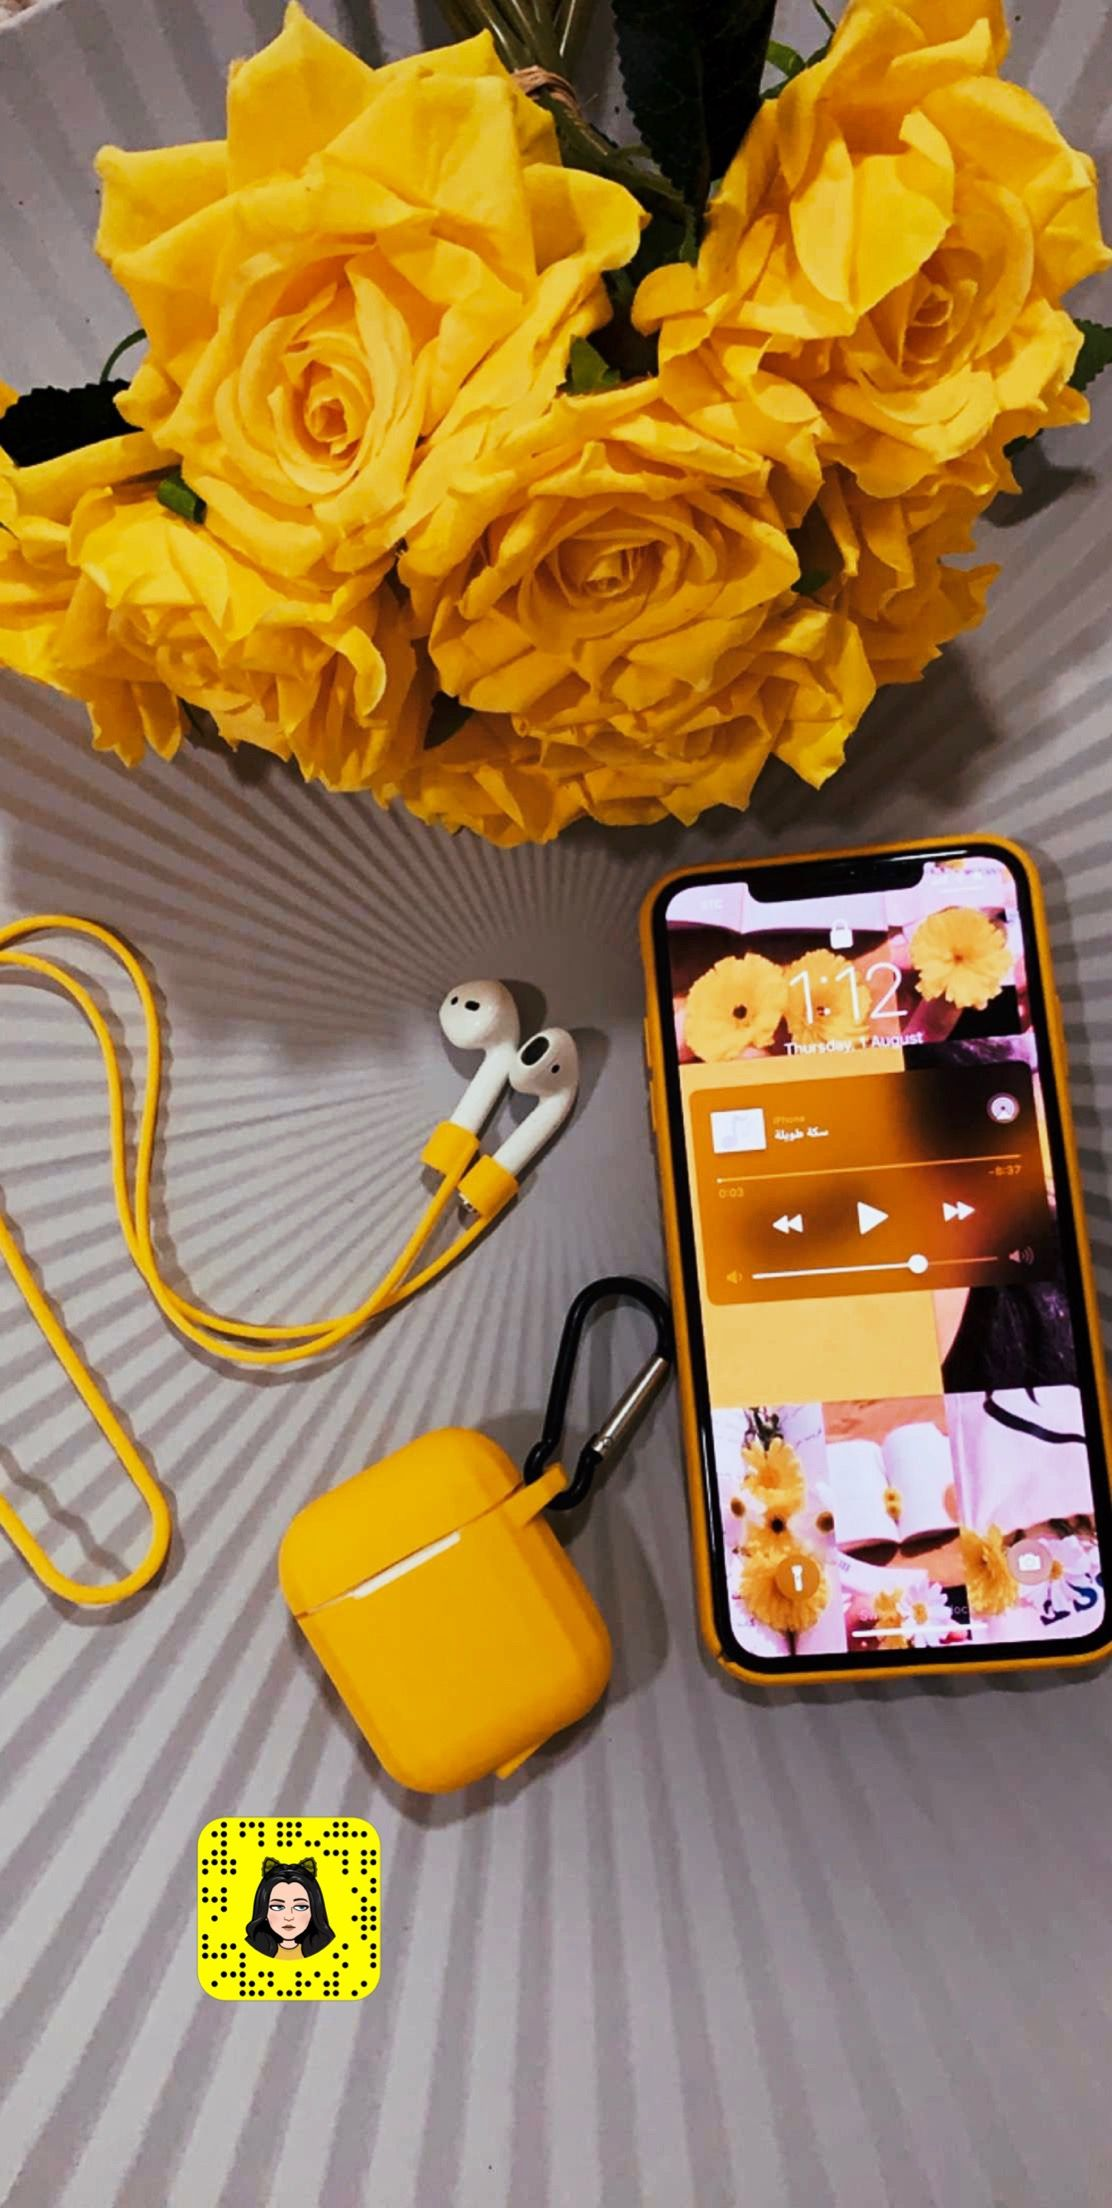 خلفيات ايفون ورد اصفر Iphone Wallpapers Download Iphone Wallpaper Iphone Wallpaper Downloads